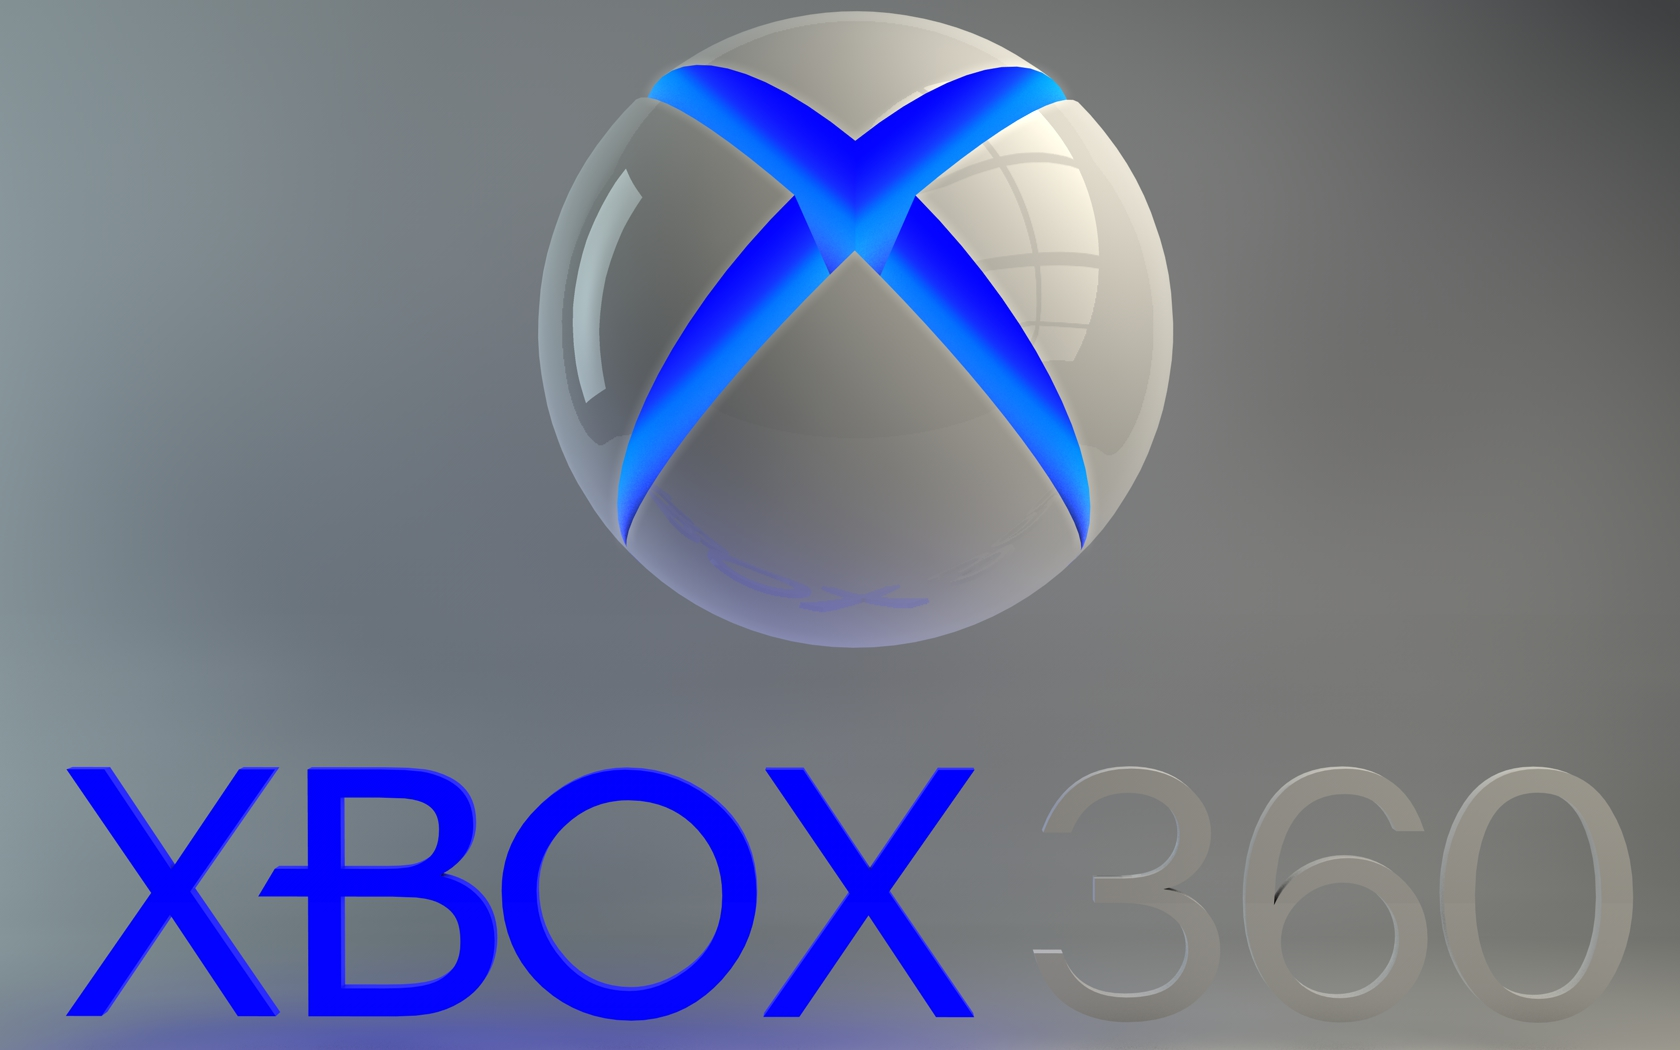 xbox 360 logo by dracuteufel666 on deviantart